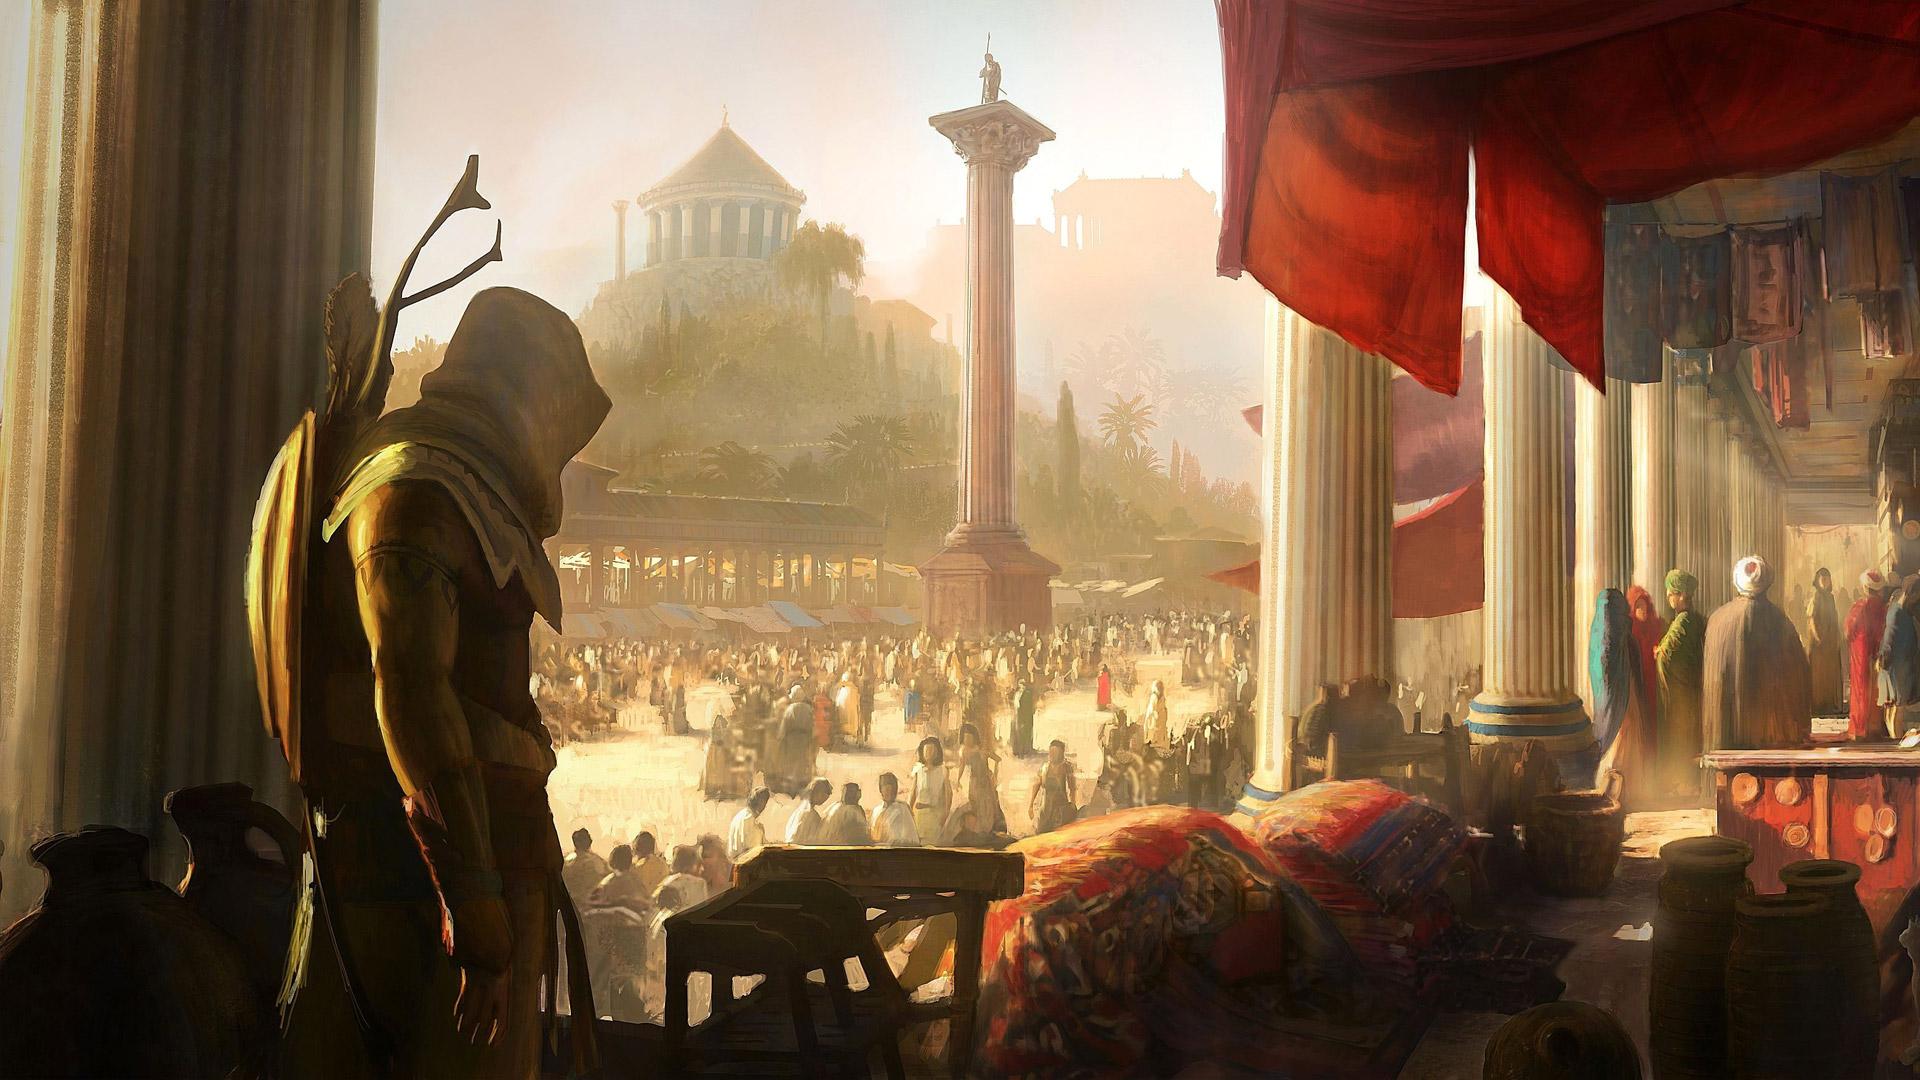 Assassin's Creed Origins Wallpaper in 1920x1080